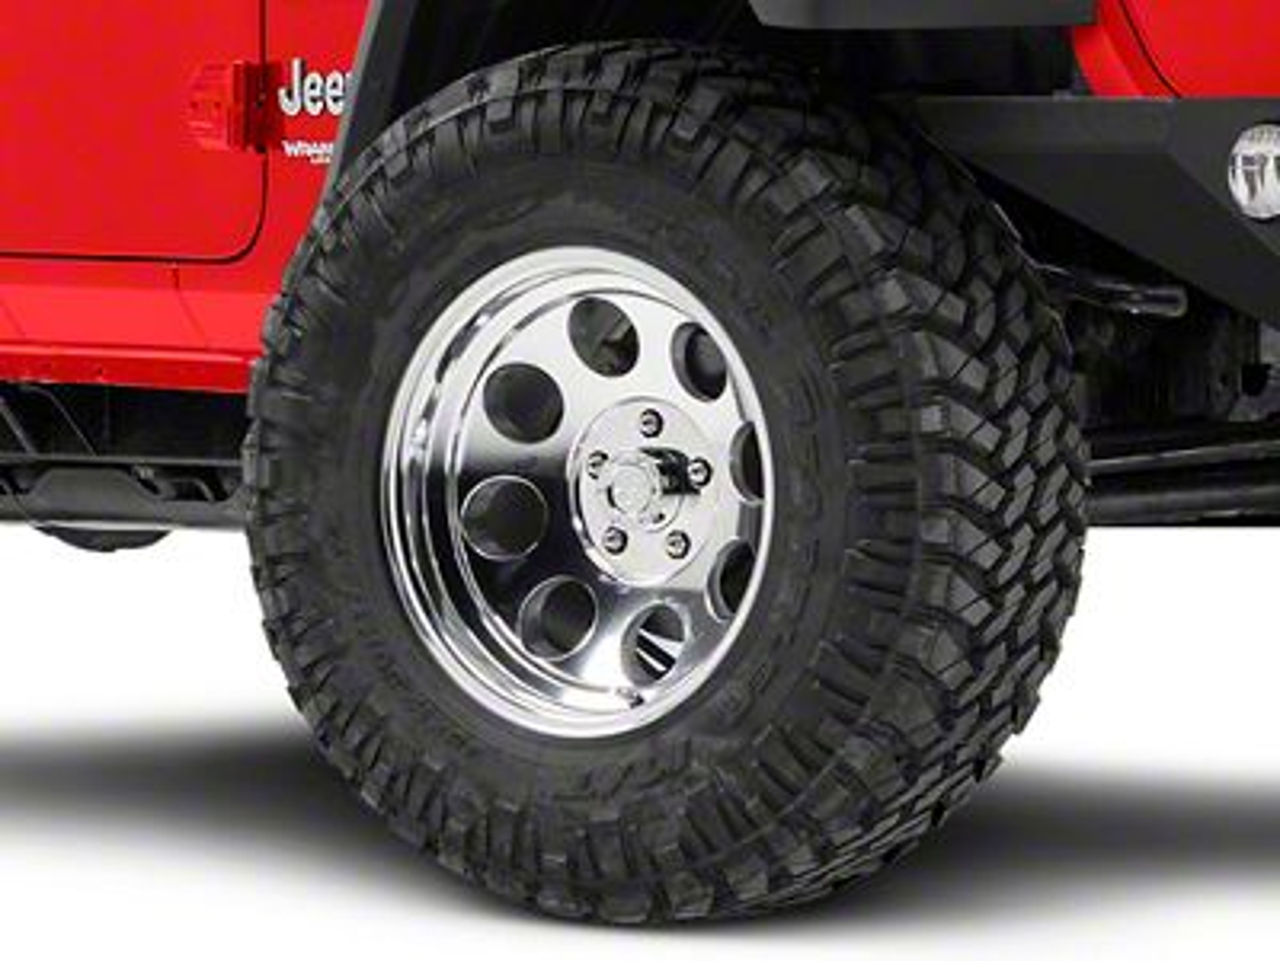 Pro Comp Wheels Series 1069 Polished Wheel - 17x9 (18-19 Jeep Wrangler JL)